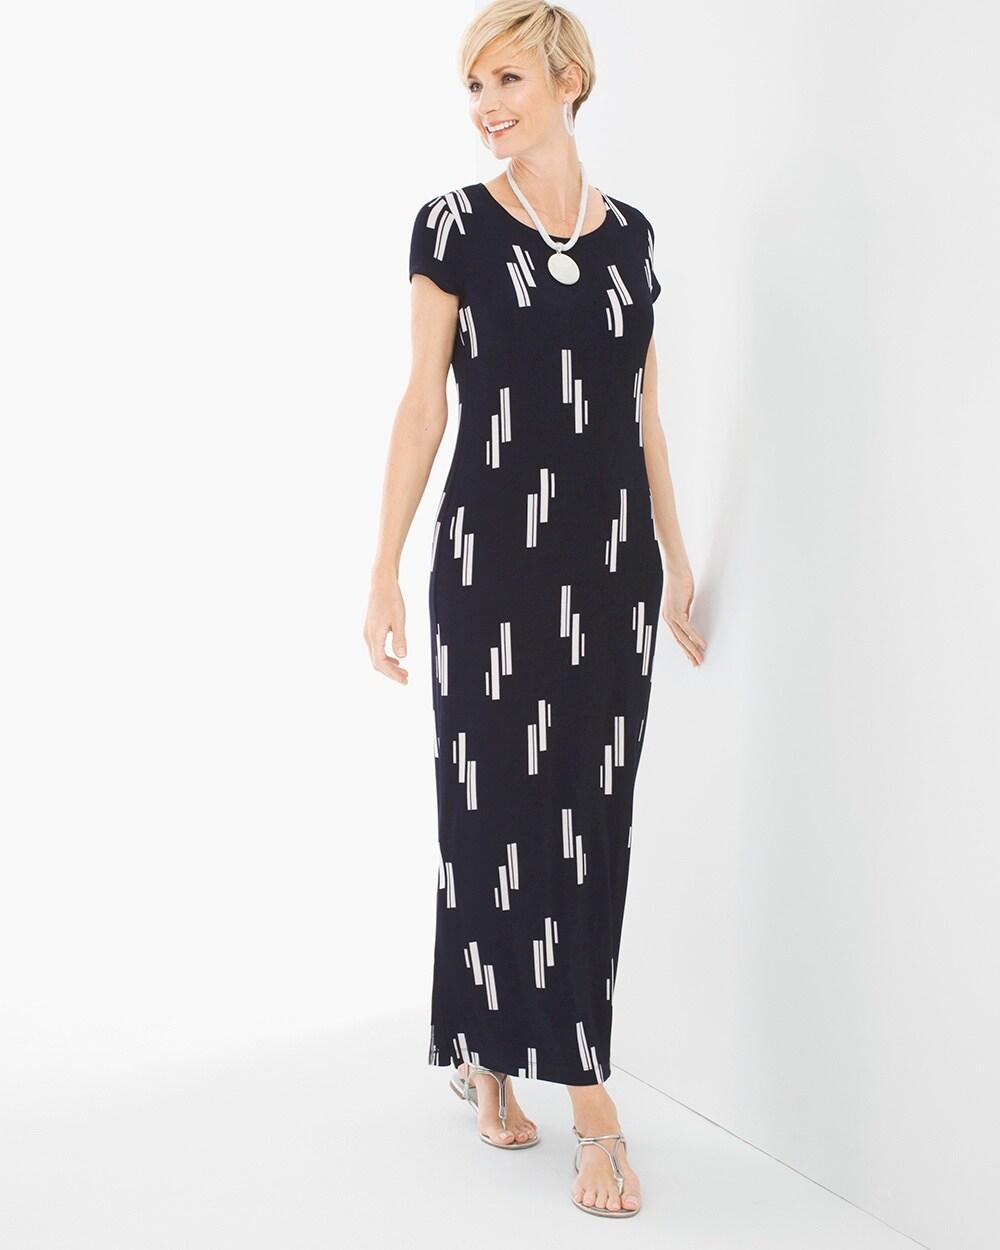 a649820c4586 Vertical Geo Printed Dress - Chico's